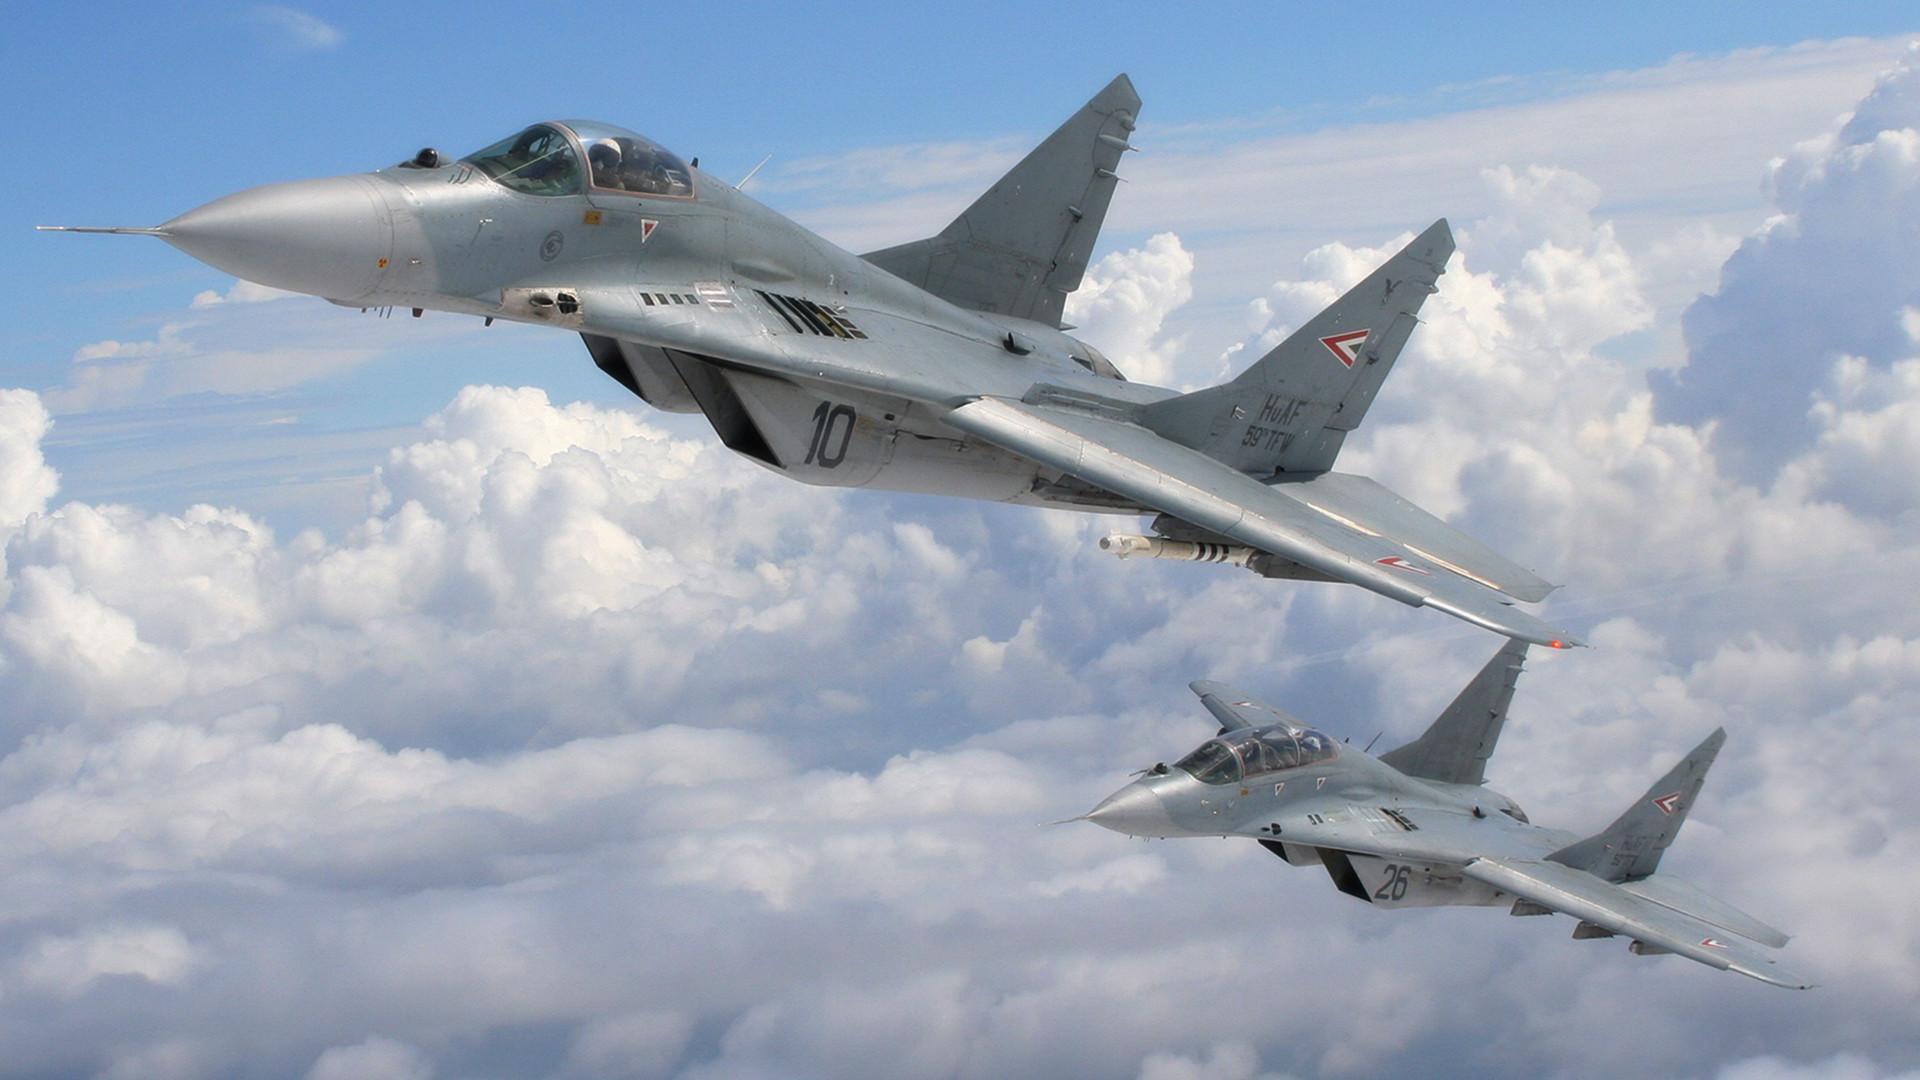 Fighter jet wallpapers more aviation desktop wallpapers voltagebd Choice Image